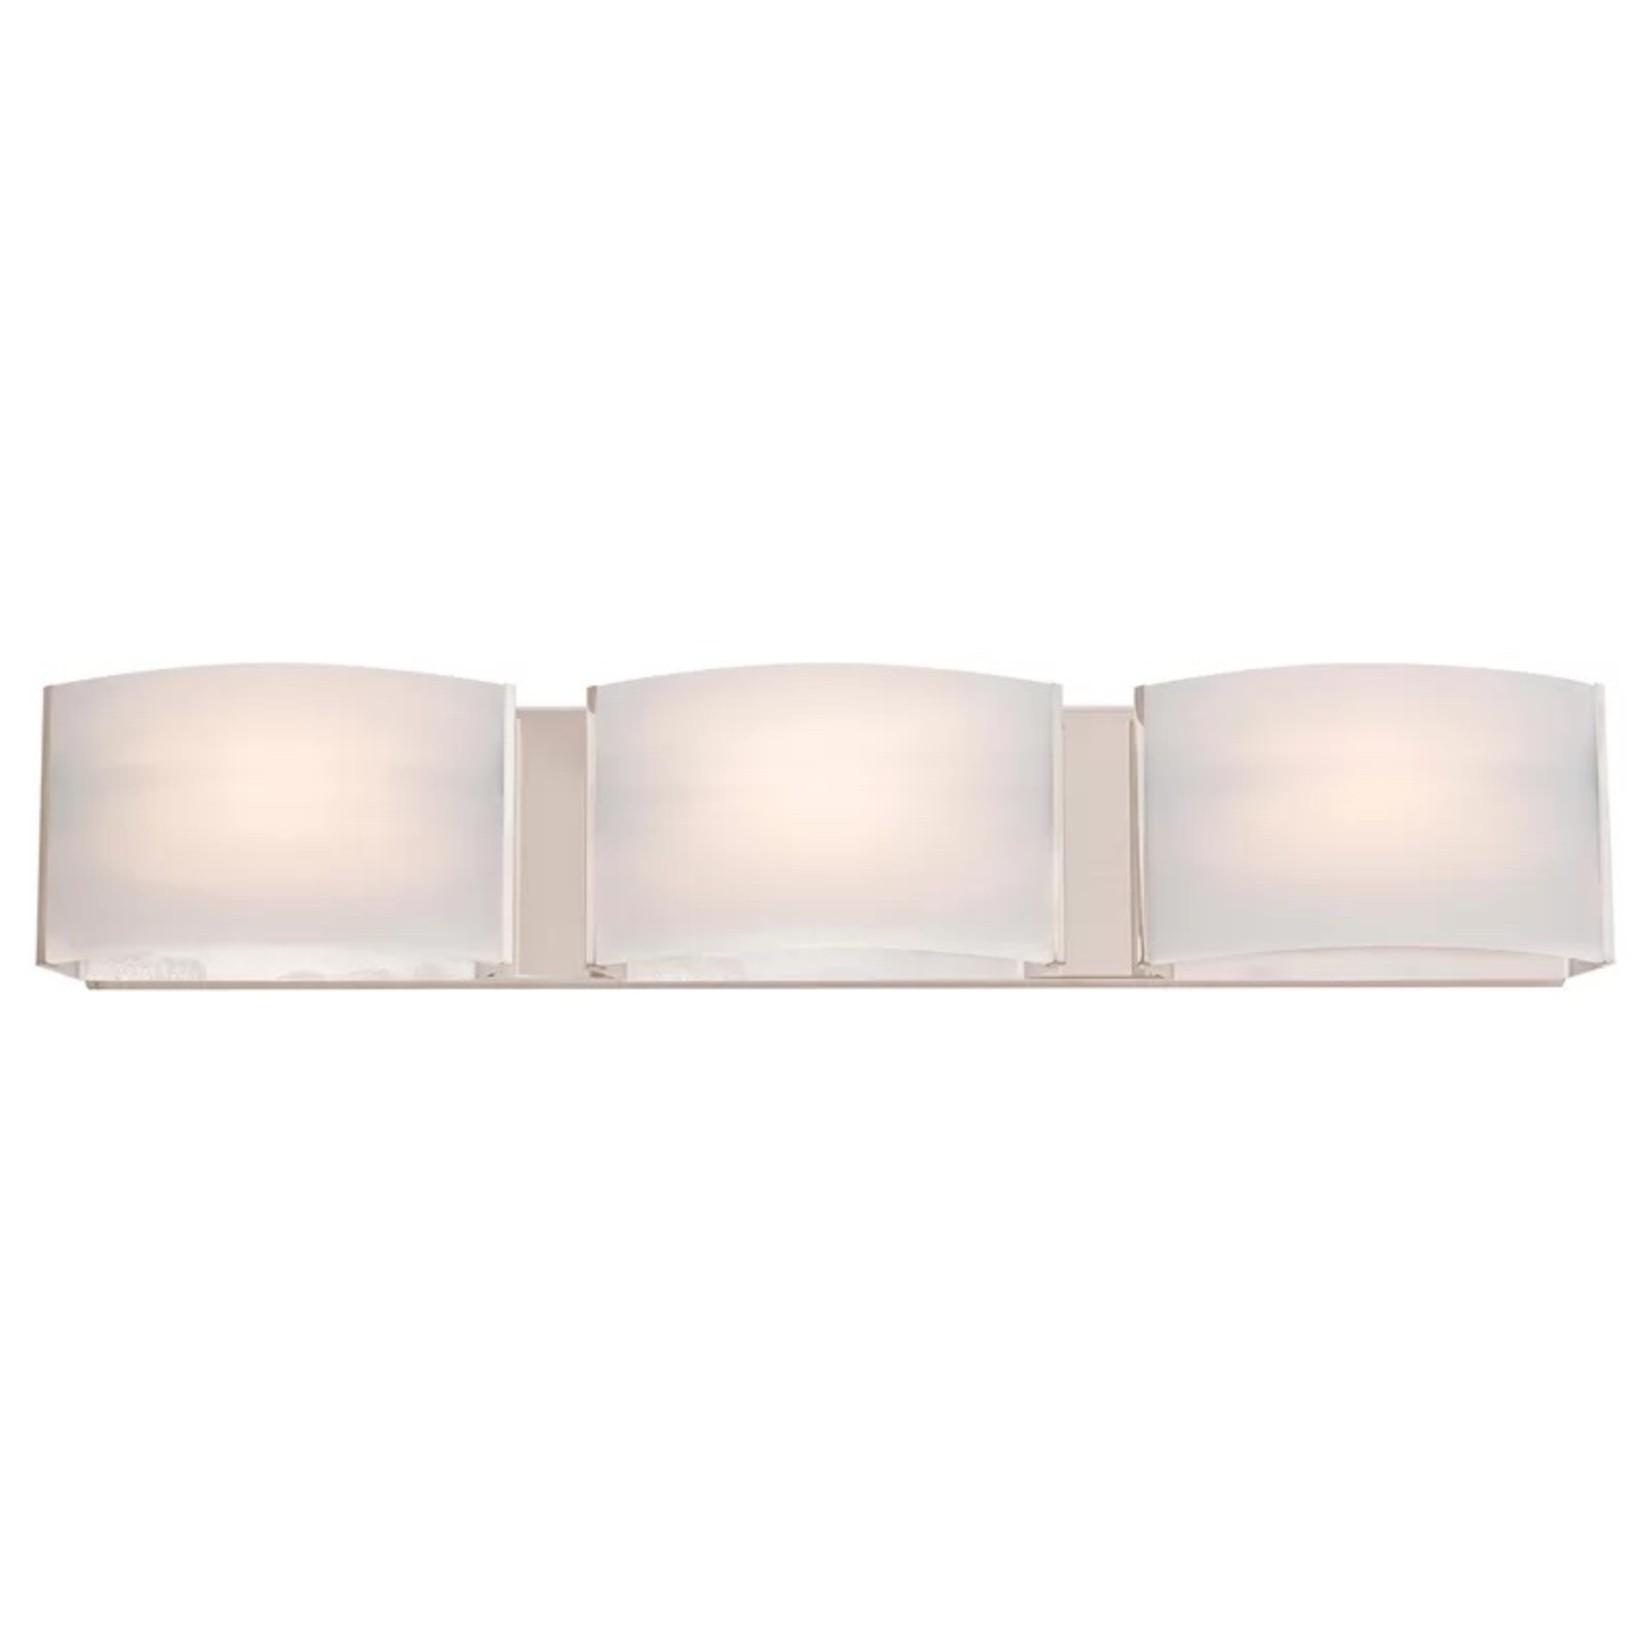 *Adrieonna 3-Light LED Vanity Light - Satin Nickel